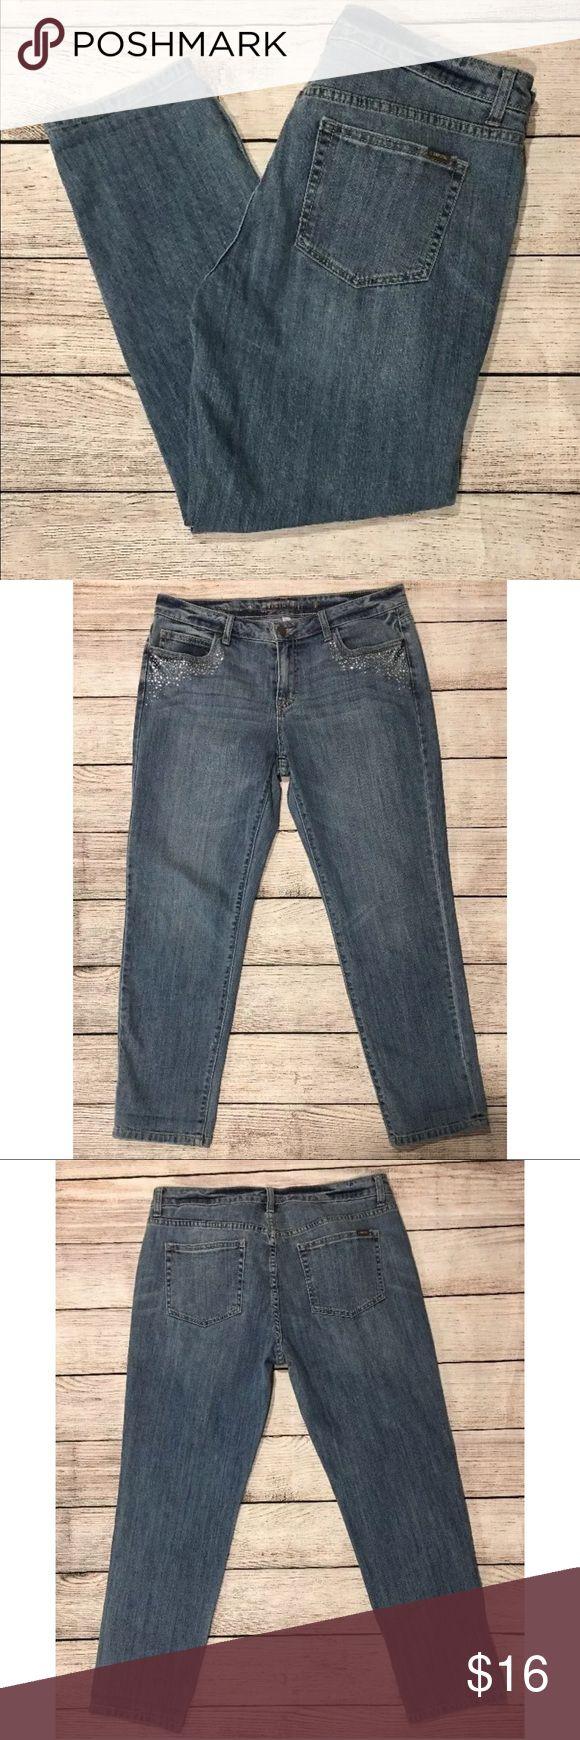 Jennifer Lopez boyfriend jeans, sz 8, Embellished Very good condition.  No tears, rips, or holes.  Smoke free, pet free home. Jennifer Lopez Jeans Boyfriend